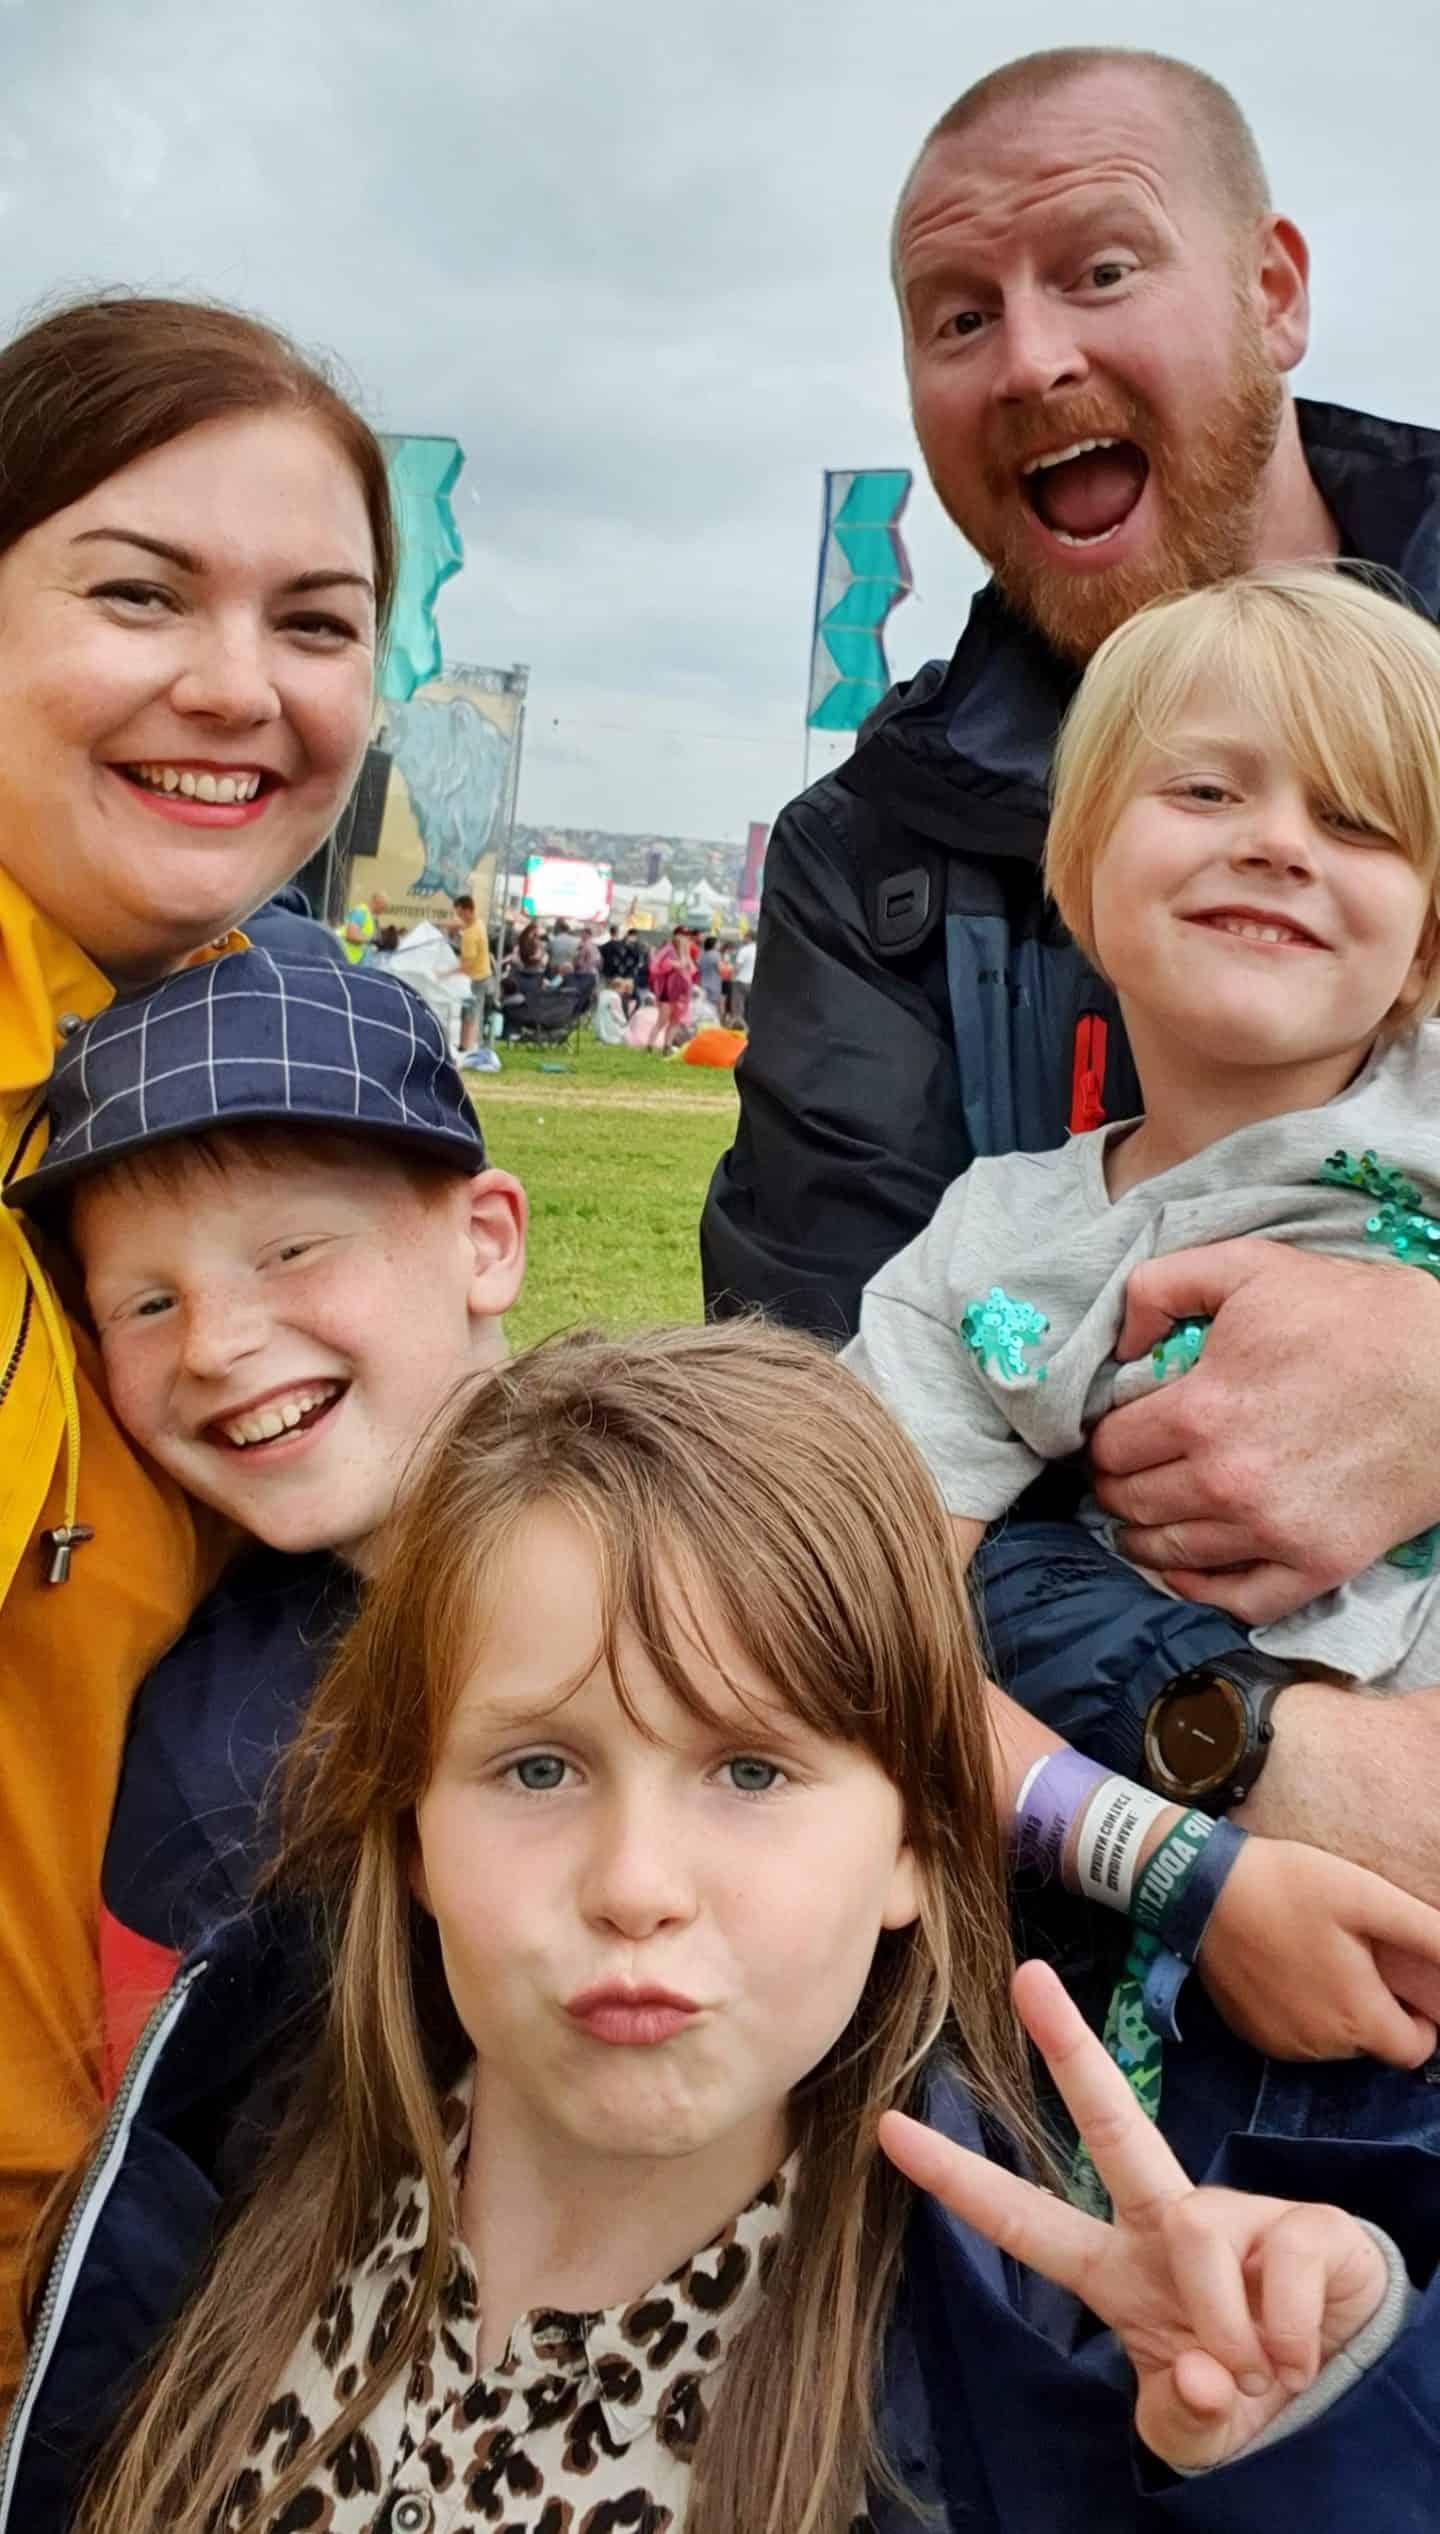 Family at YNot Festival July 2019